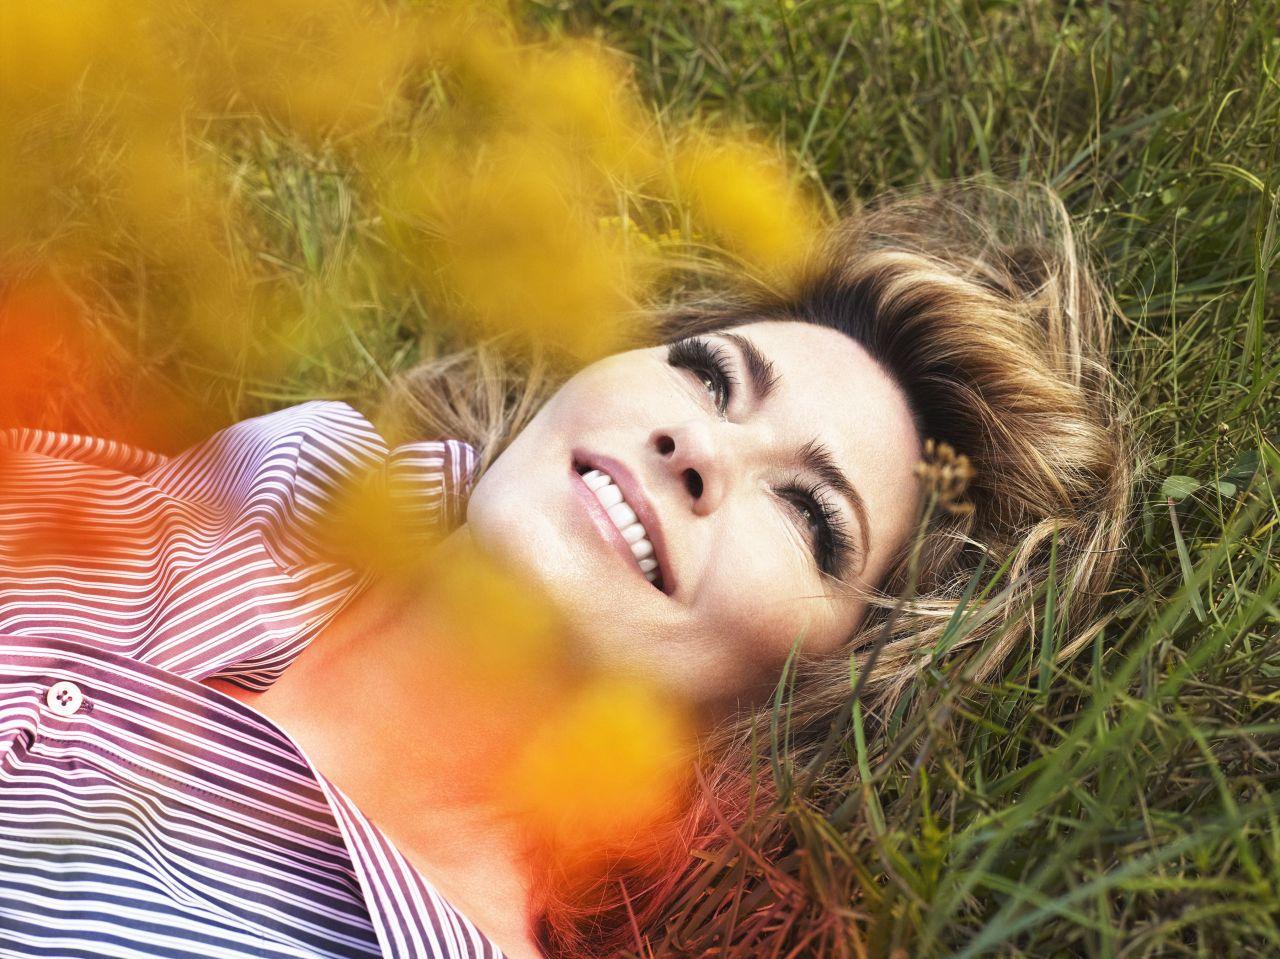 http://celebmafia.com/wp-content/uploads/2017/08/shania-twain-promotion-for-her-new-cd-now-2017-1.jpg